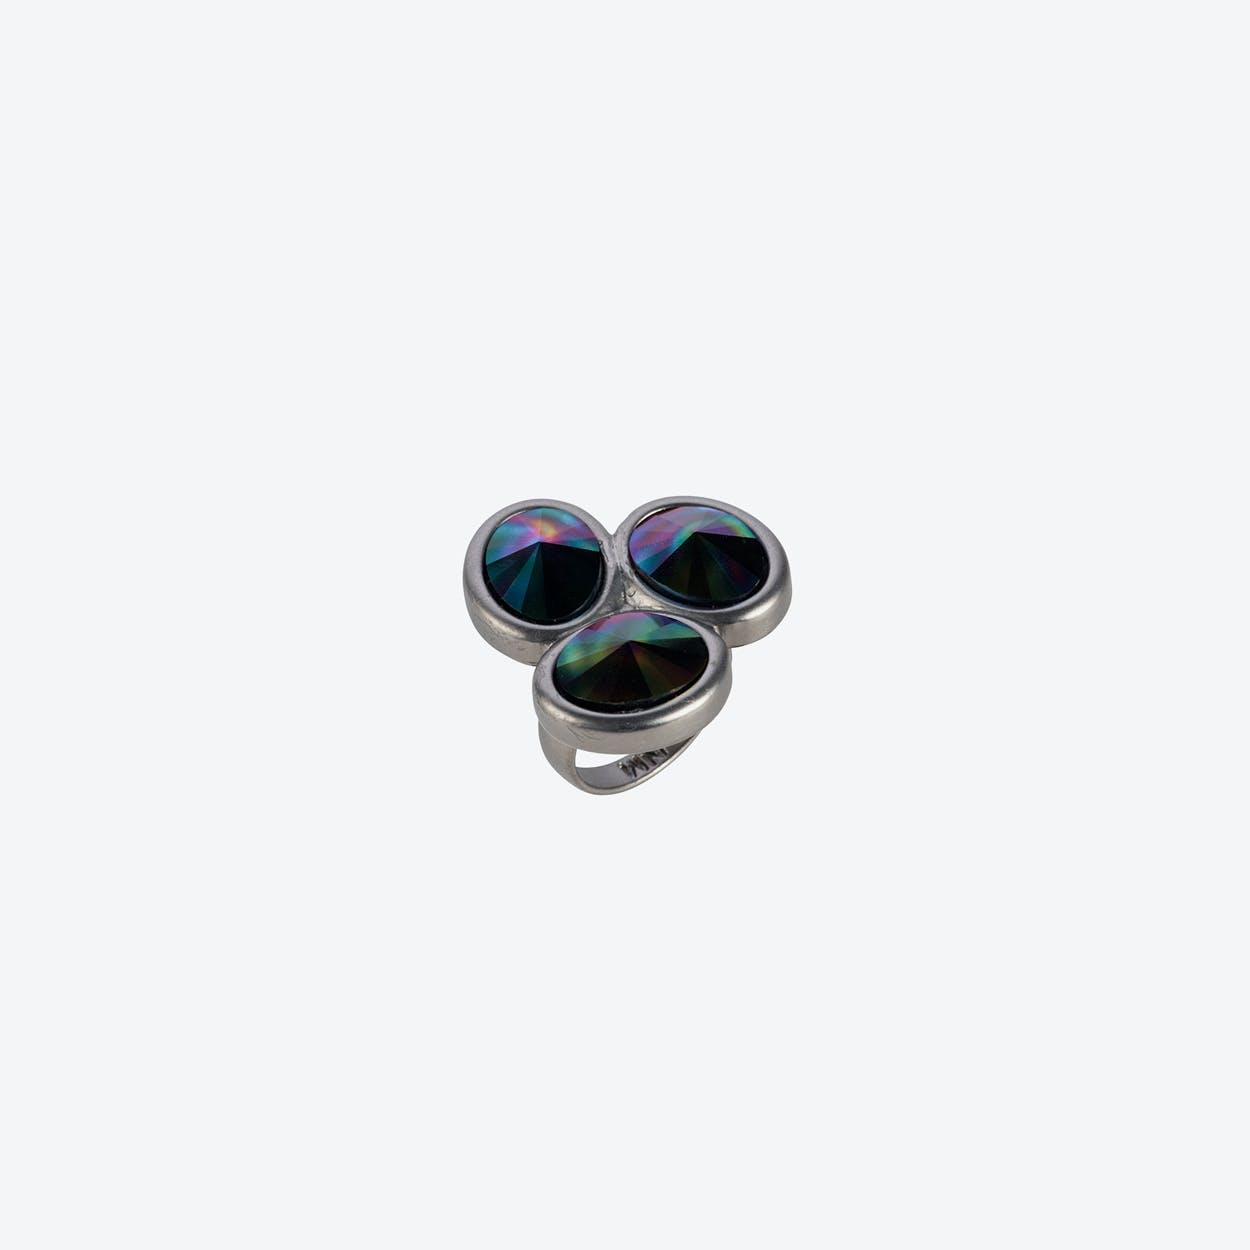 Triple Stone Oval Ring in Matte Gunmetal & Dark Rainbow